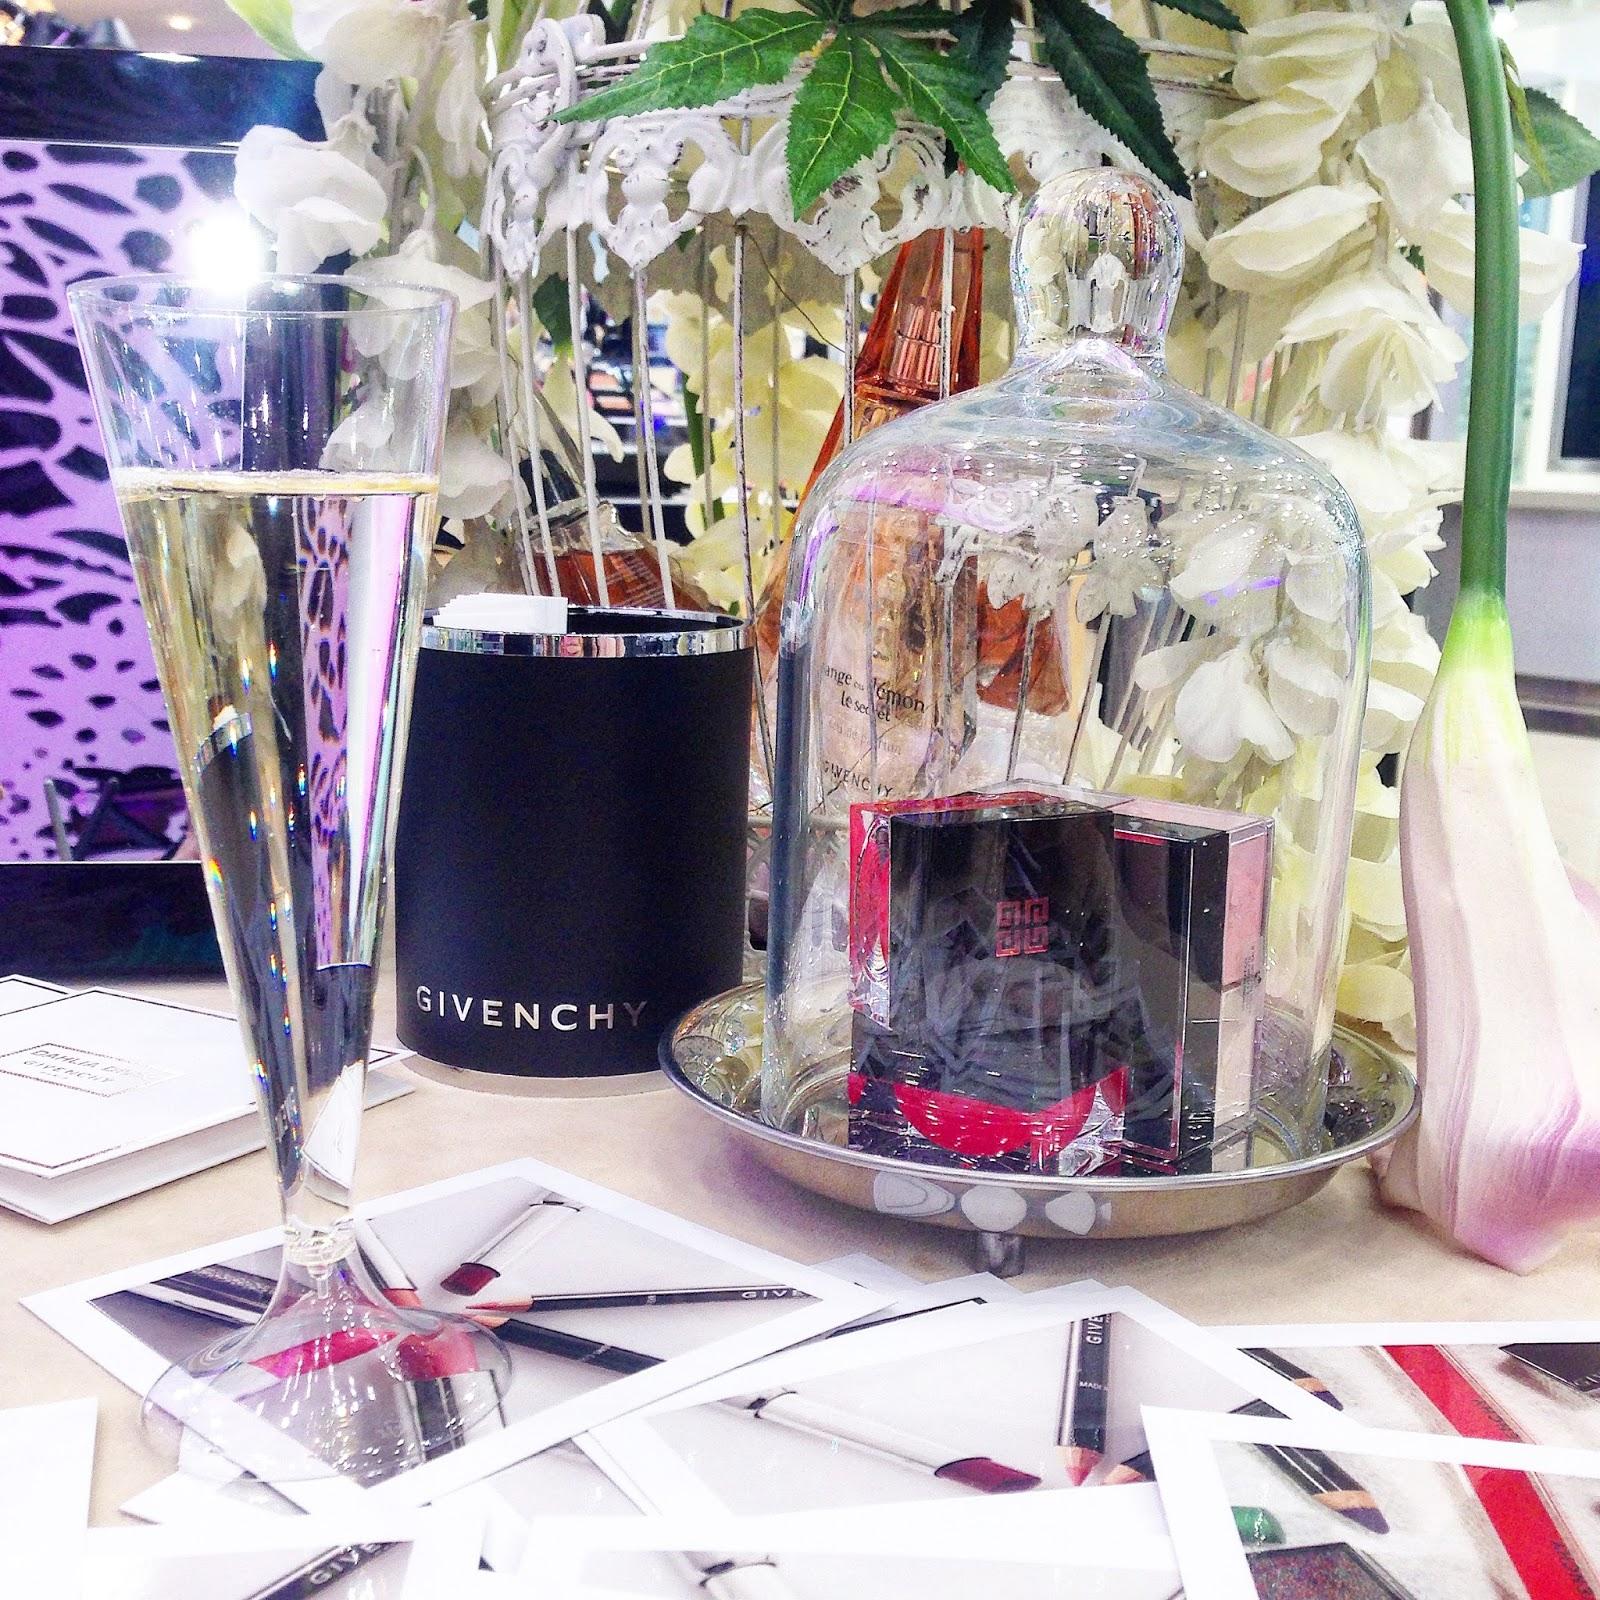 Осенняя коллекция макияжа Givenchy Vinyl Collection 2015